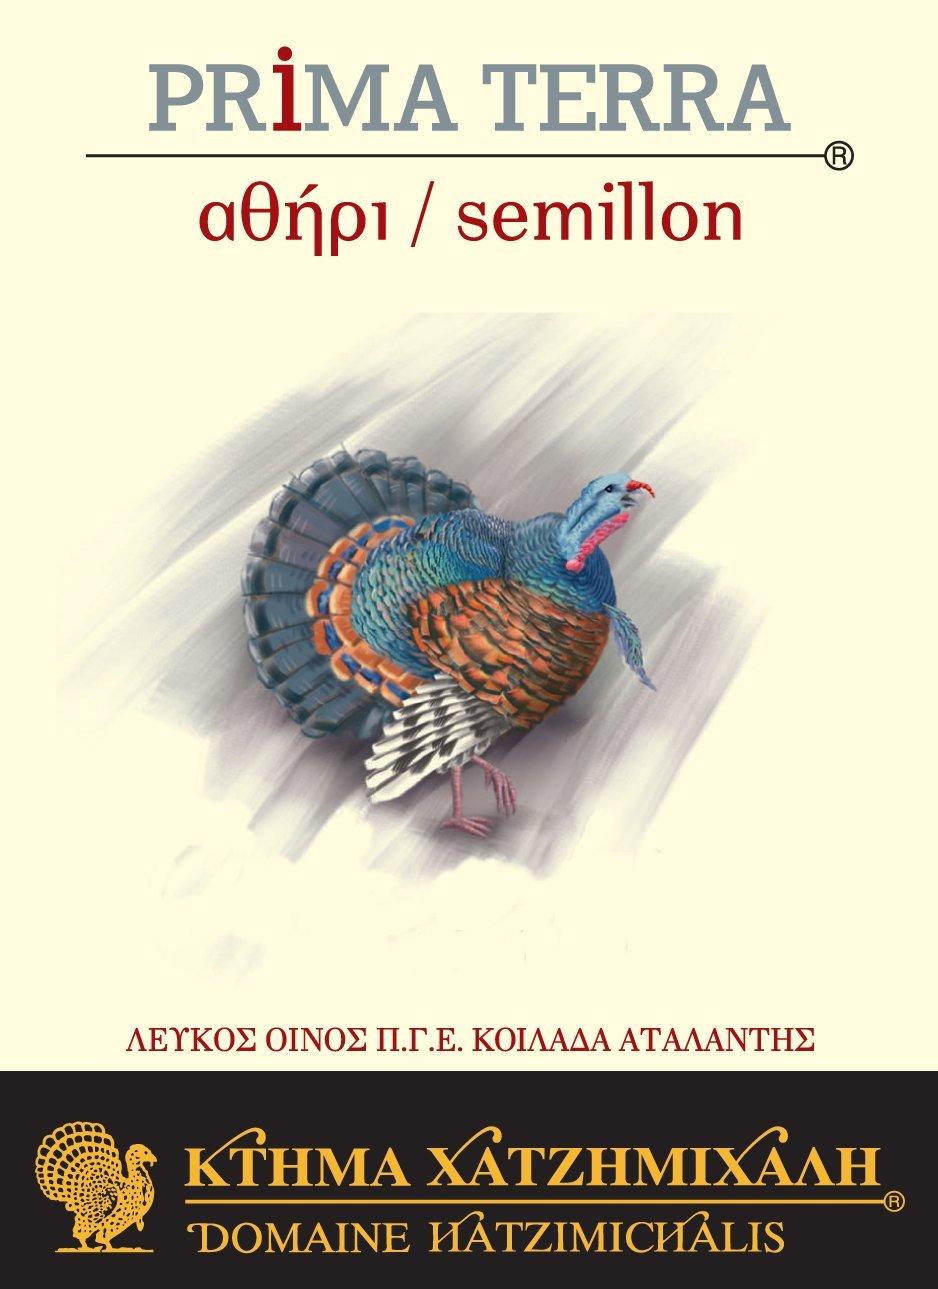 Athiri/Semillon Hatzimichalis